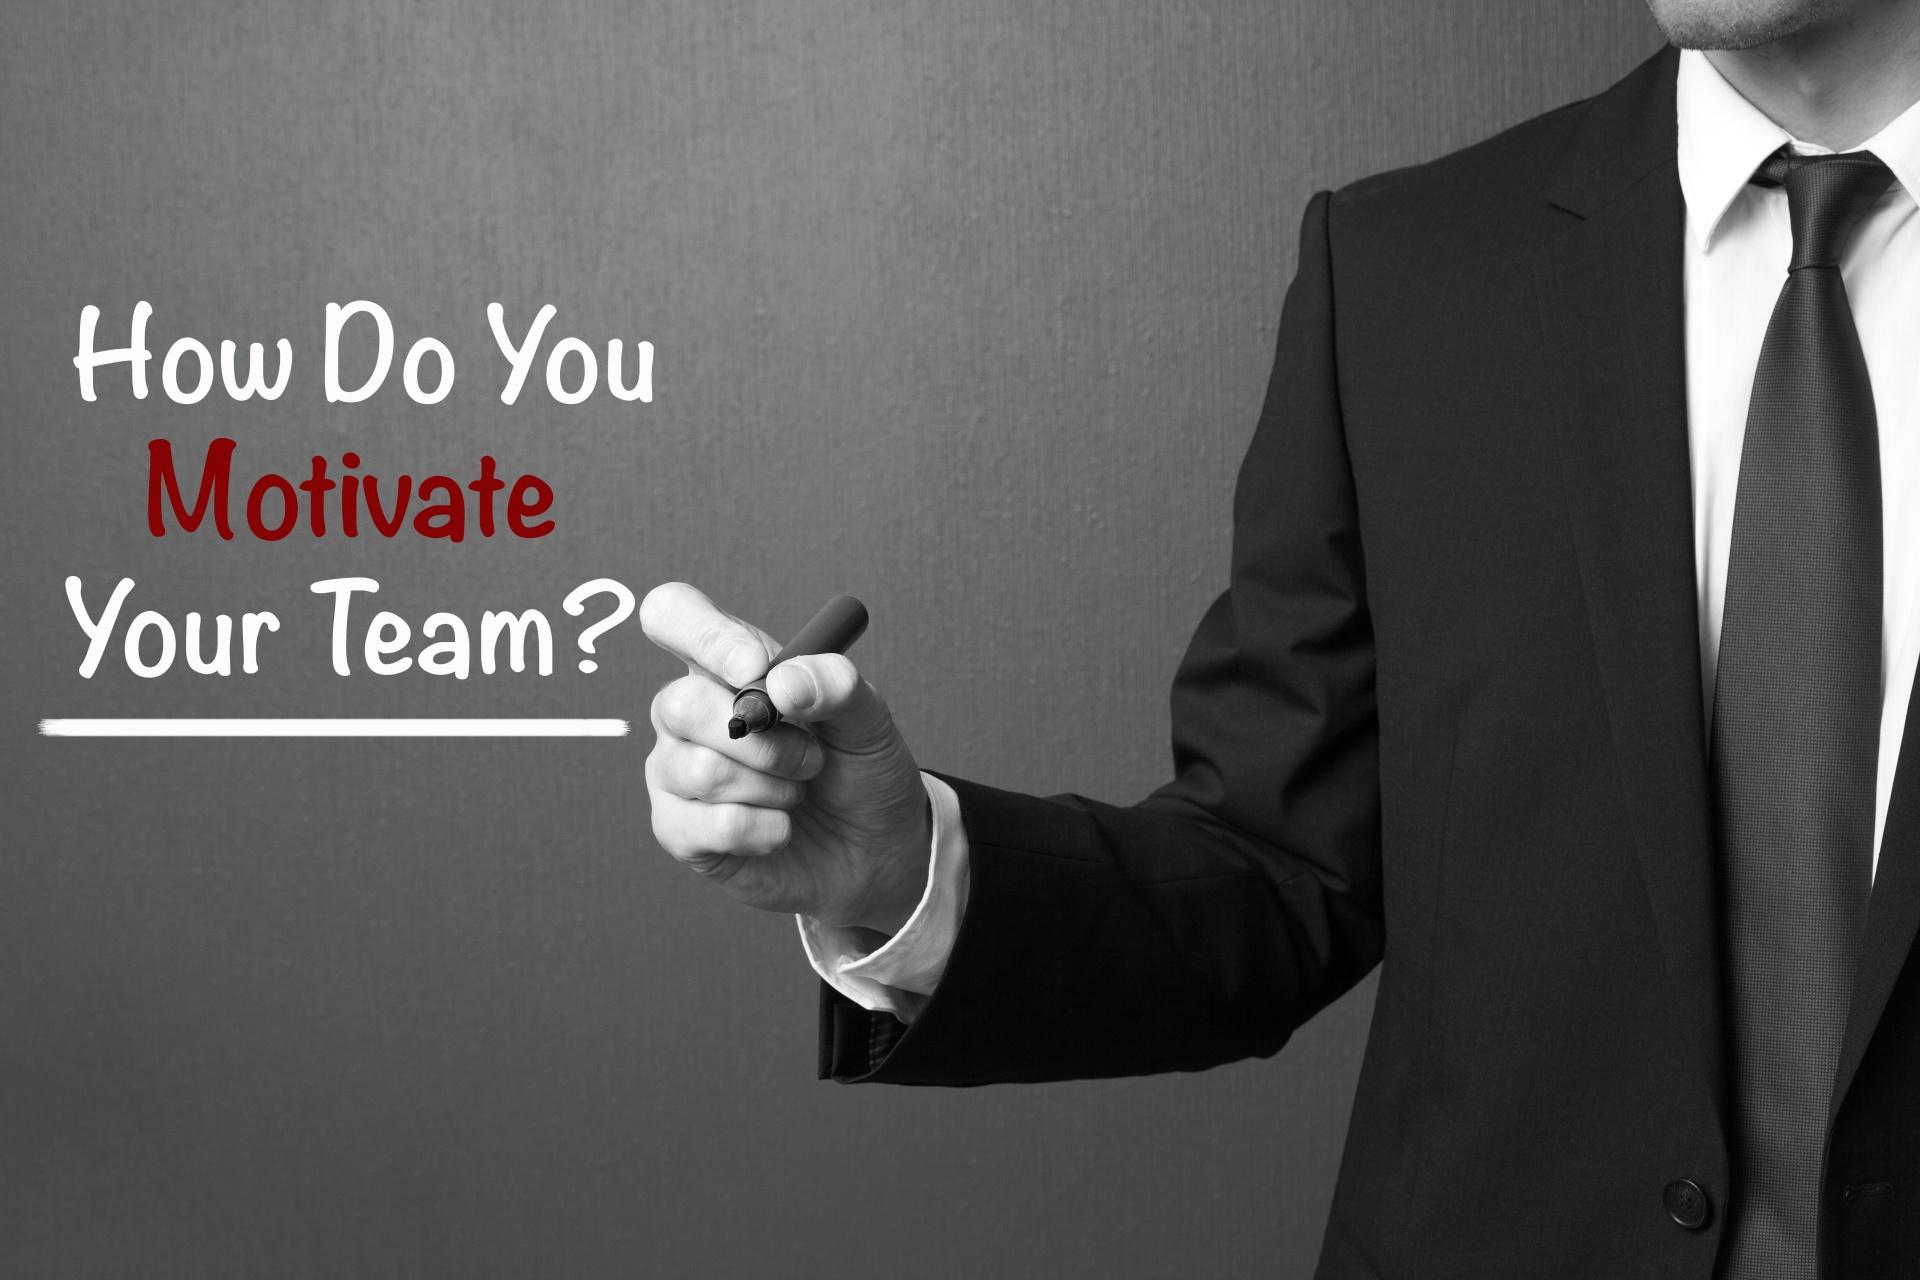 Business man writing: How Do You Motivate Your Team?